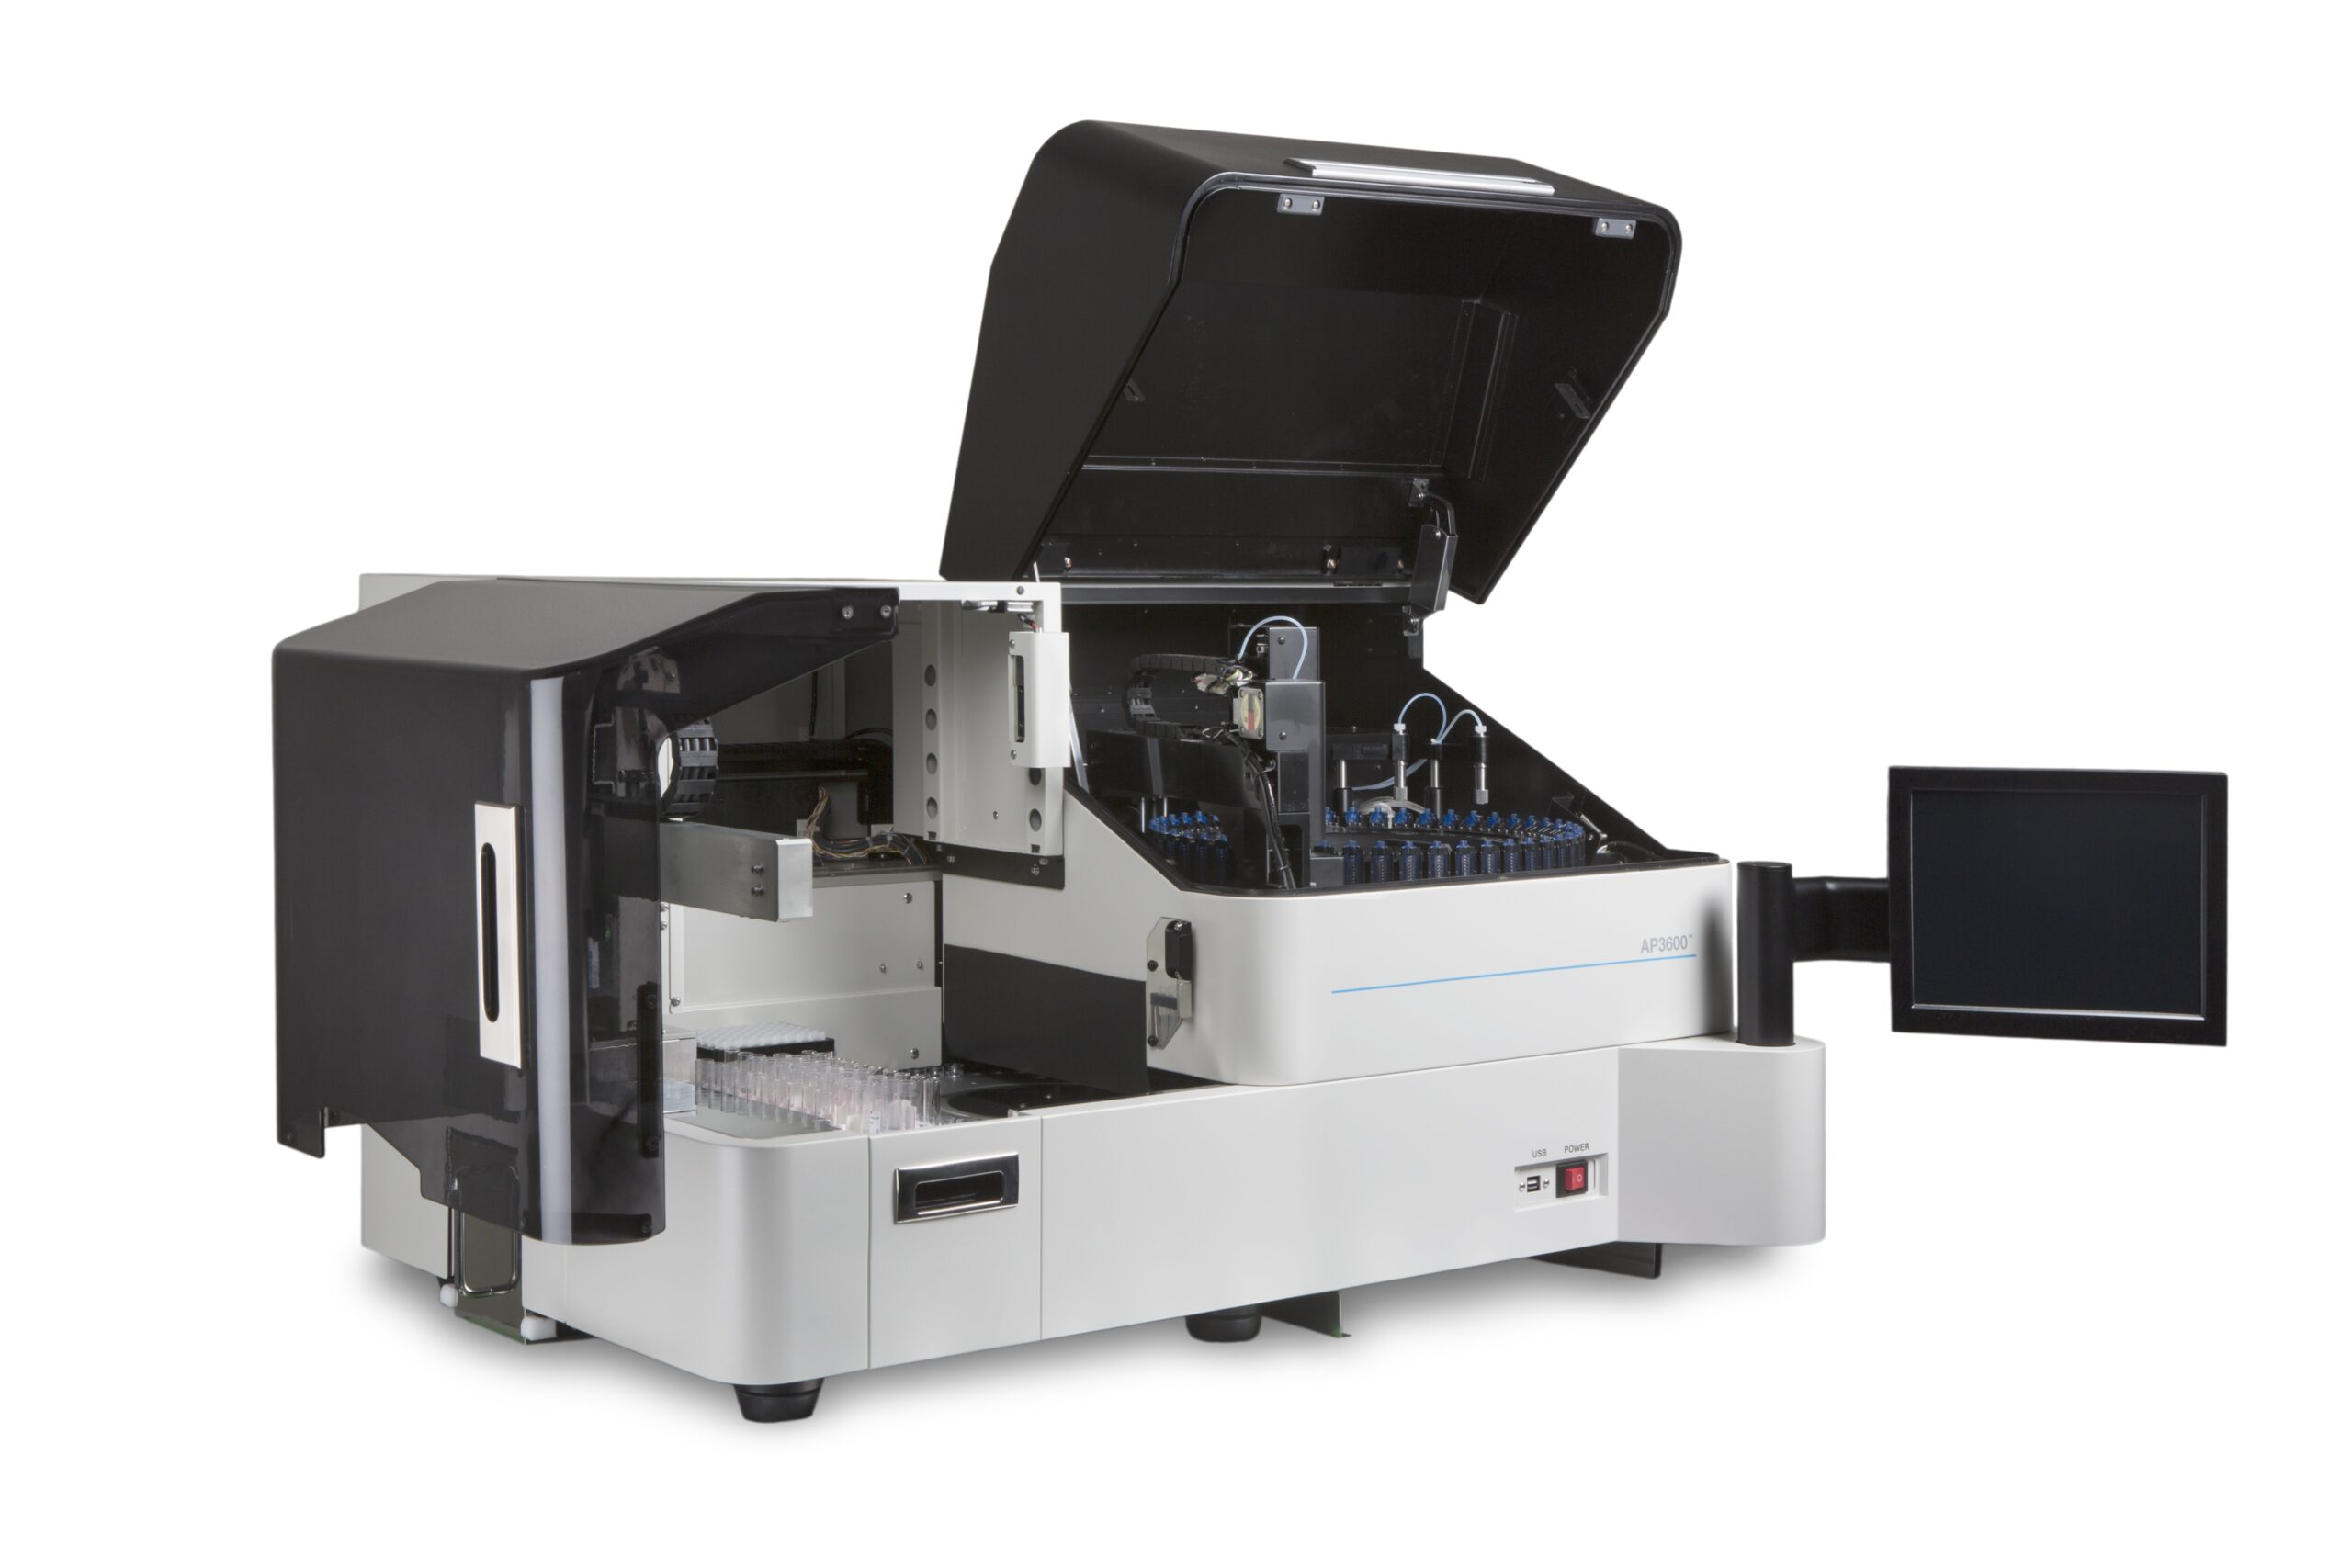 AP3600 allergy analyzer